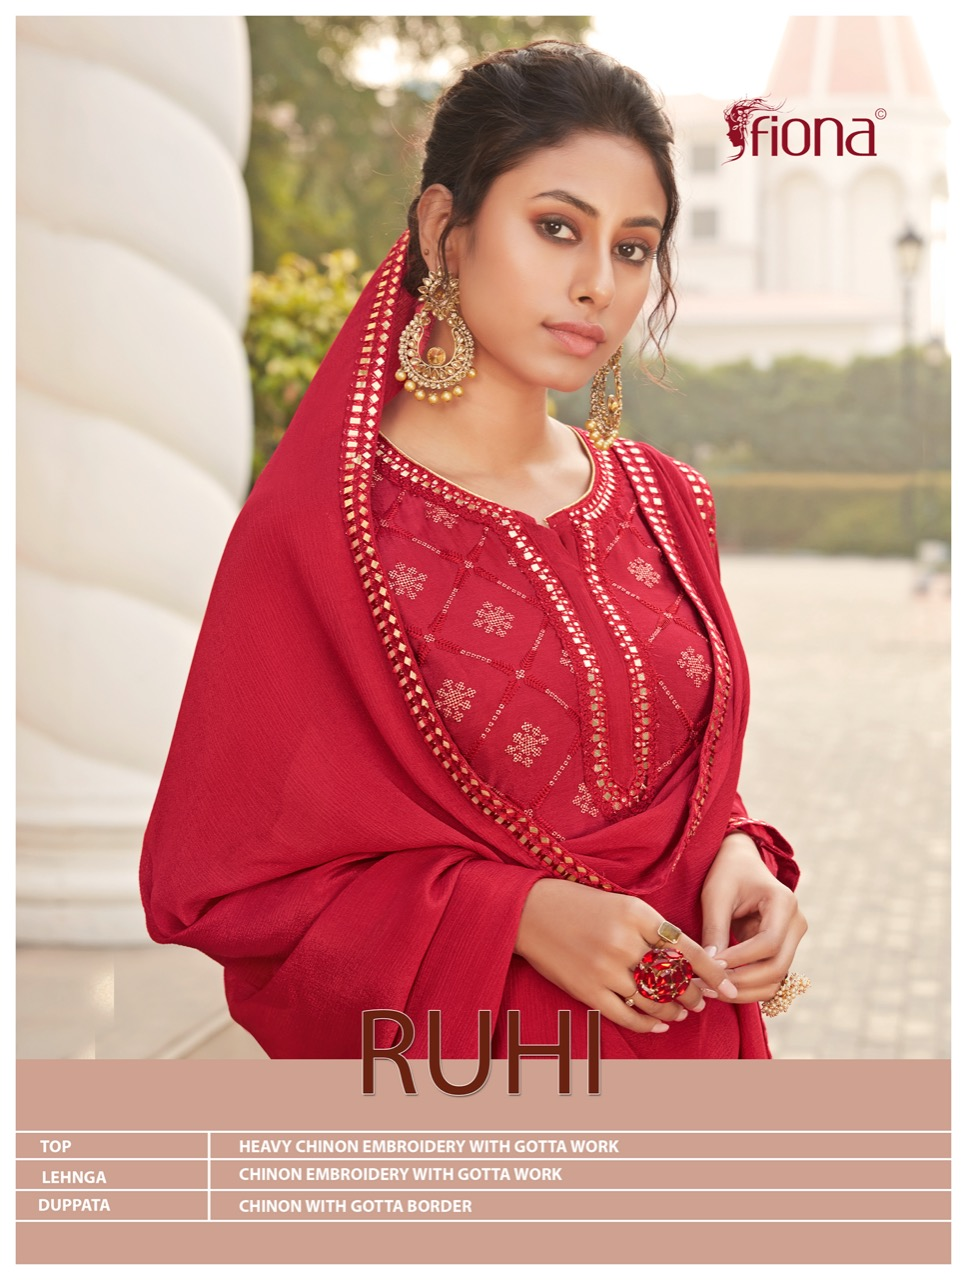 Fiona Ruhi Salwar Suit Wholesale Catalog 4 Pcs 8 - Fiona Ruhi Salwar Suit Wholesale Catalog 4 Pcs